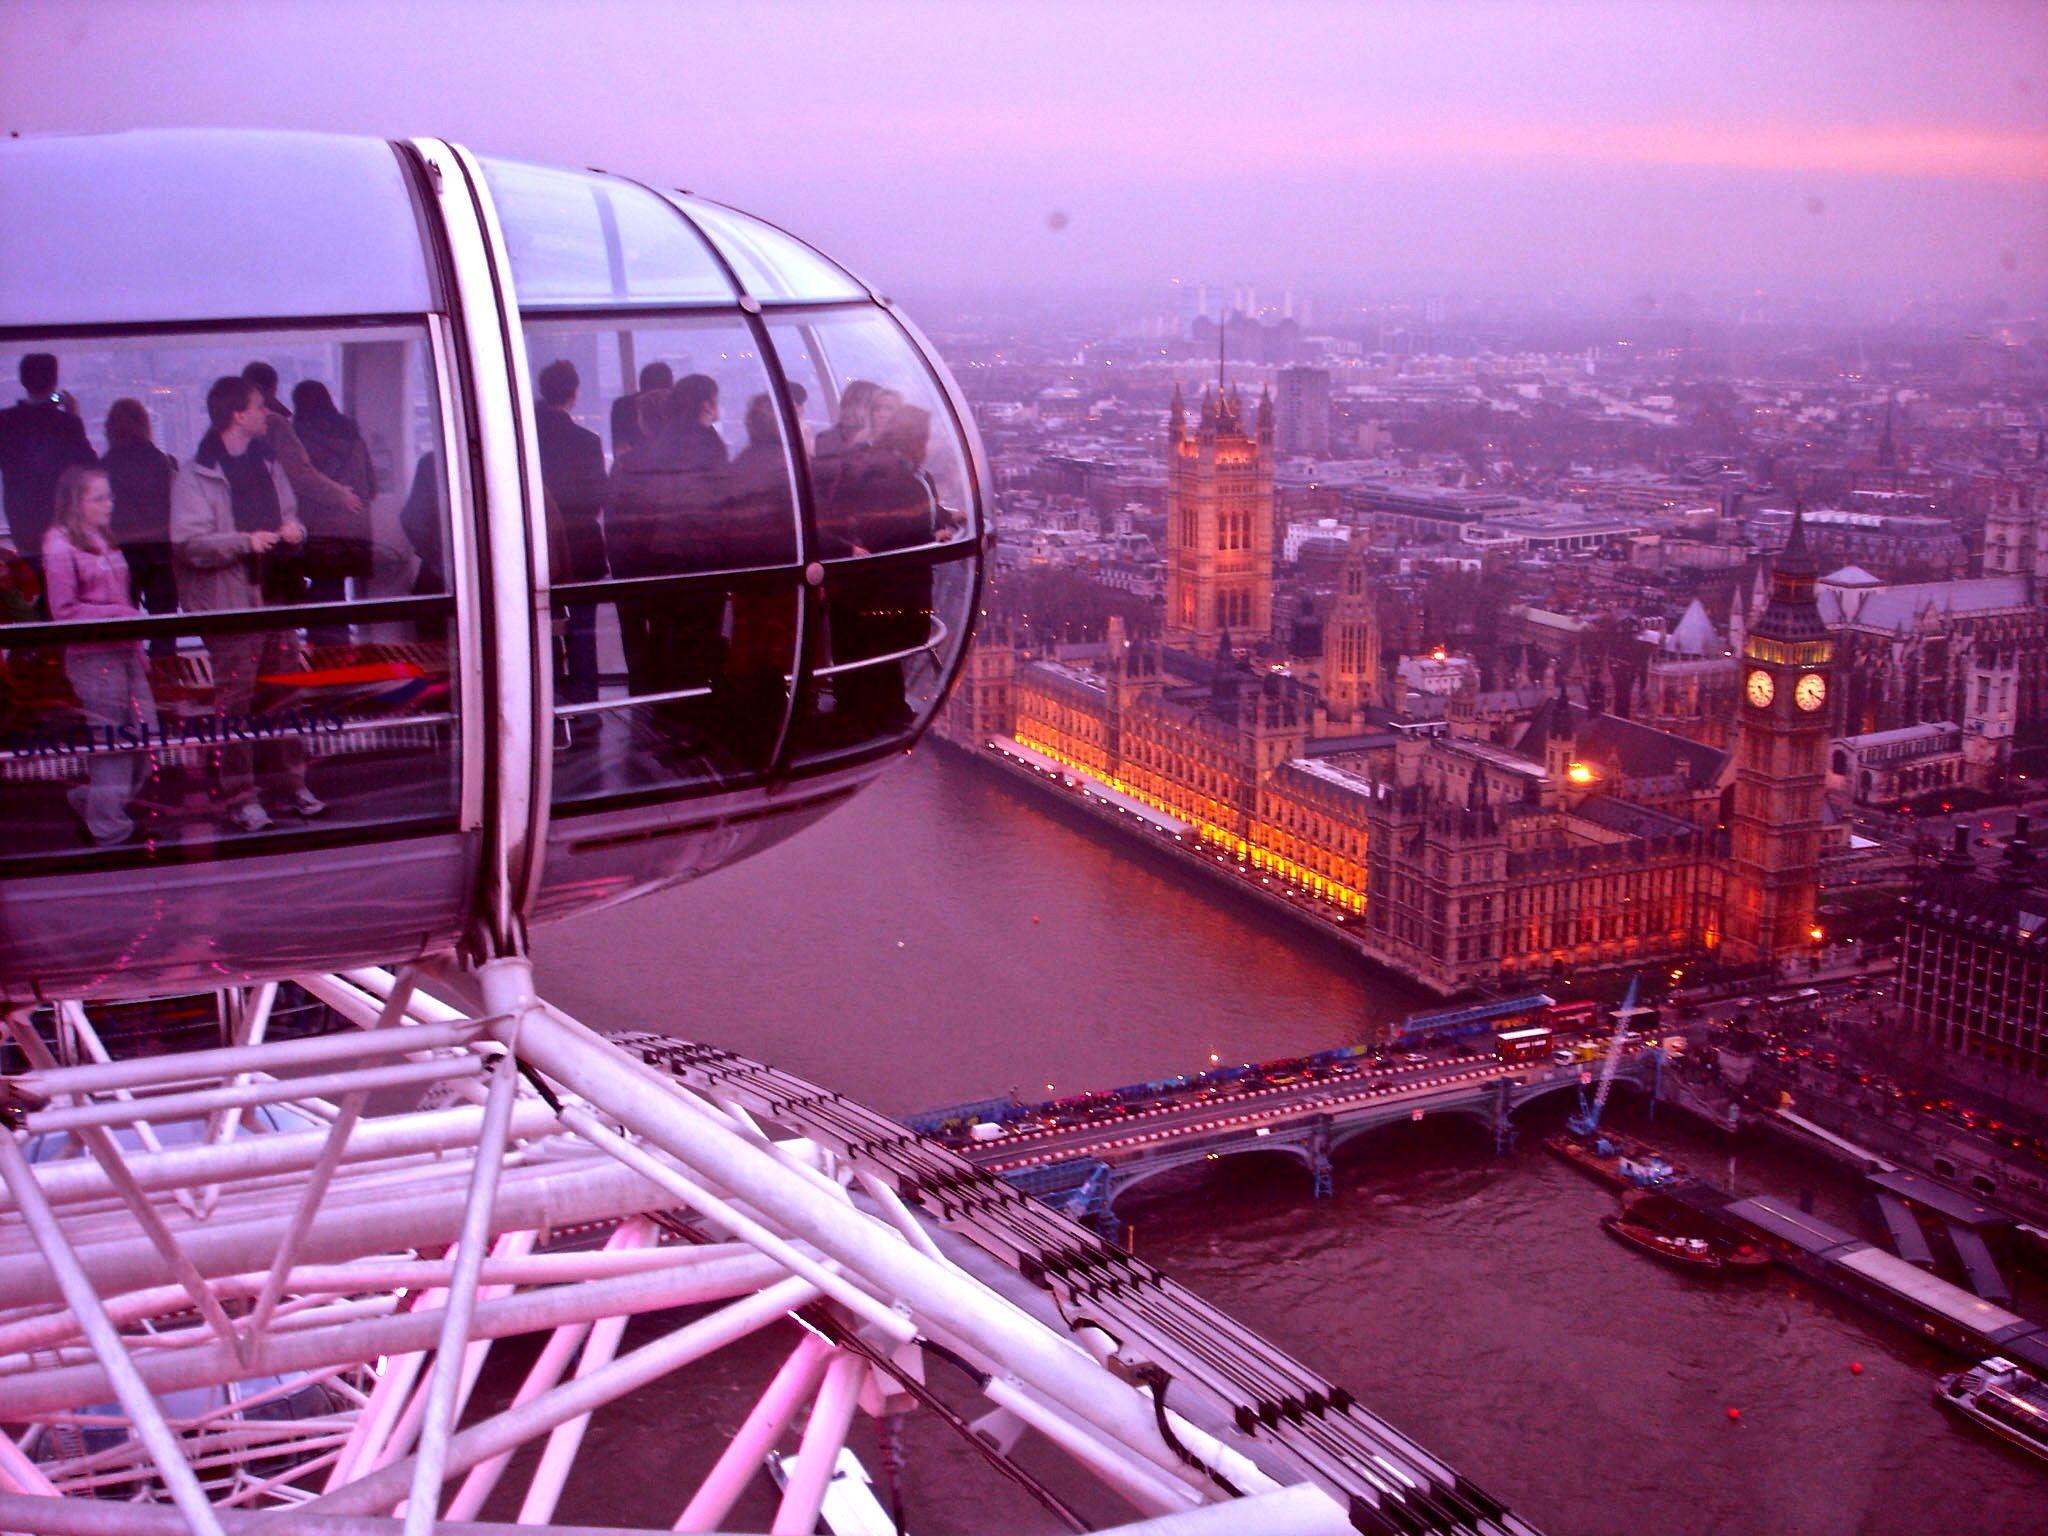 London eye by adelmo braga